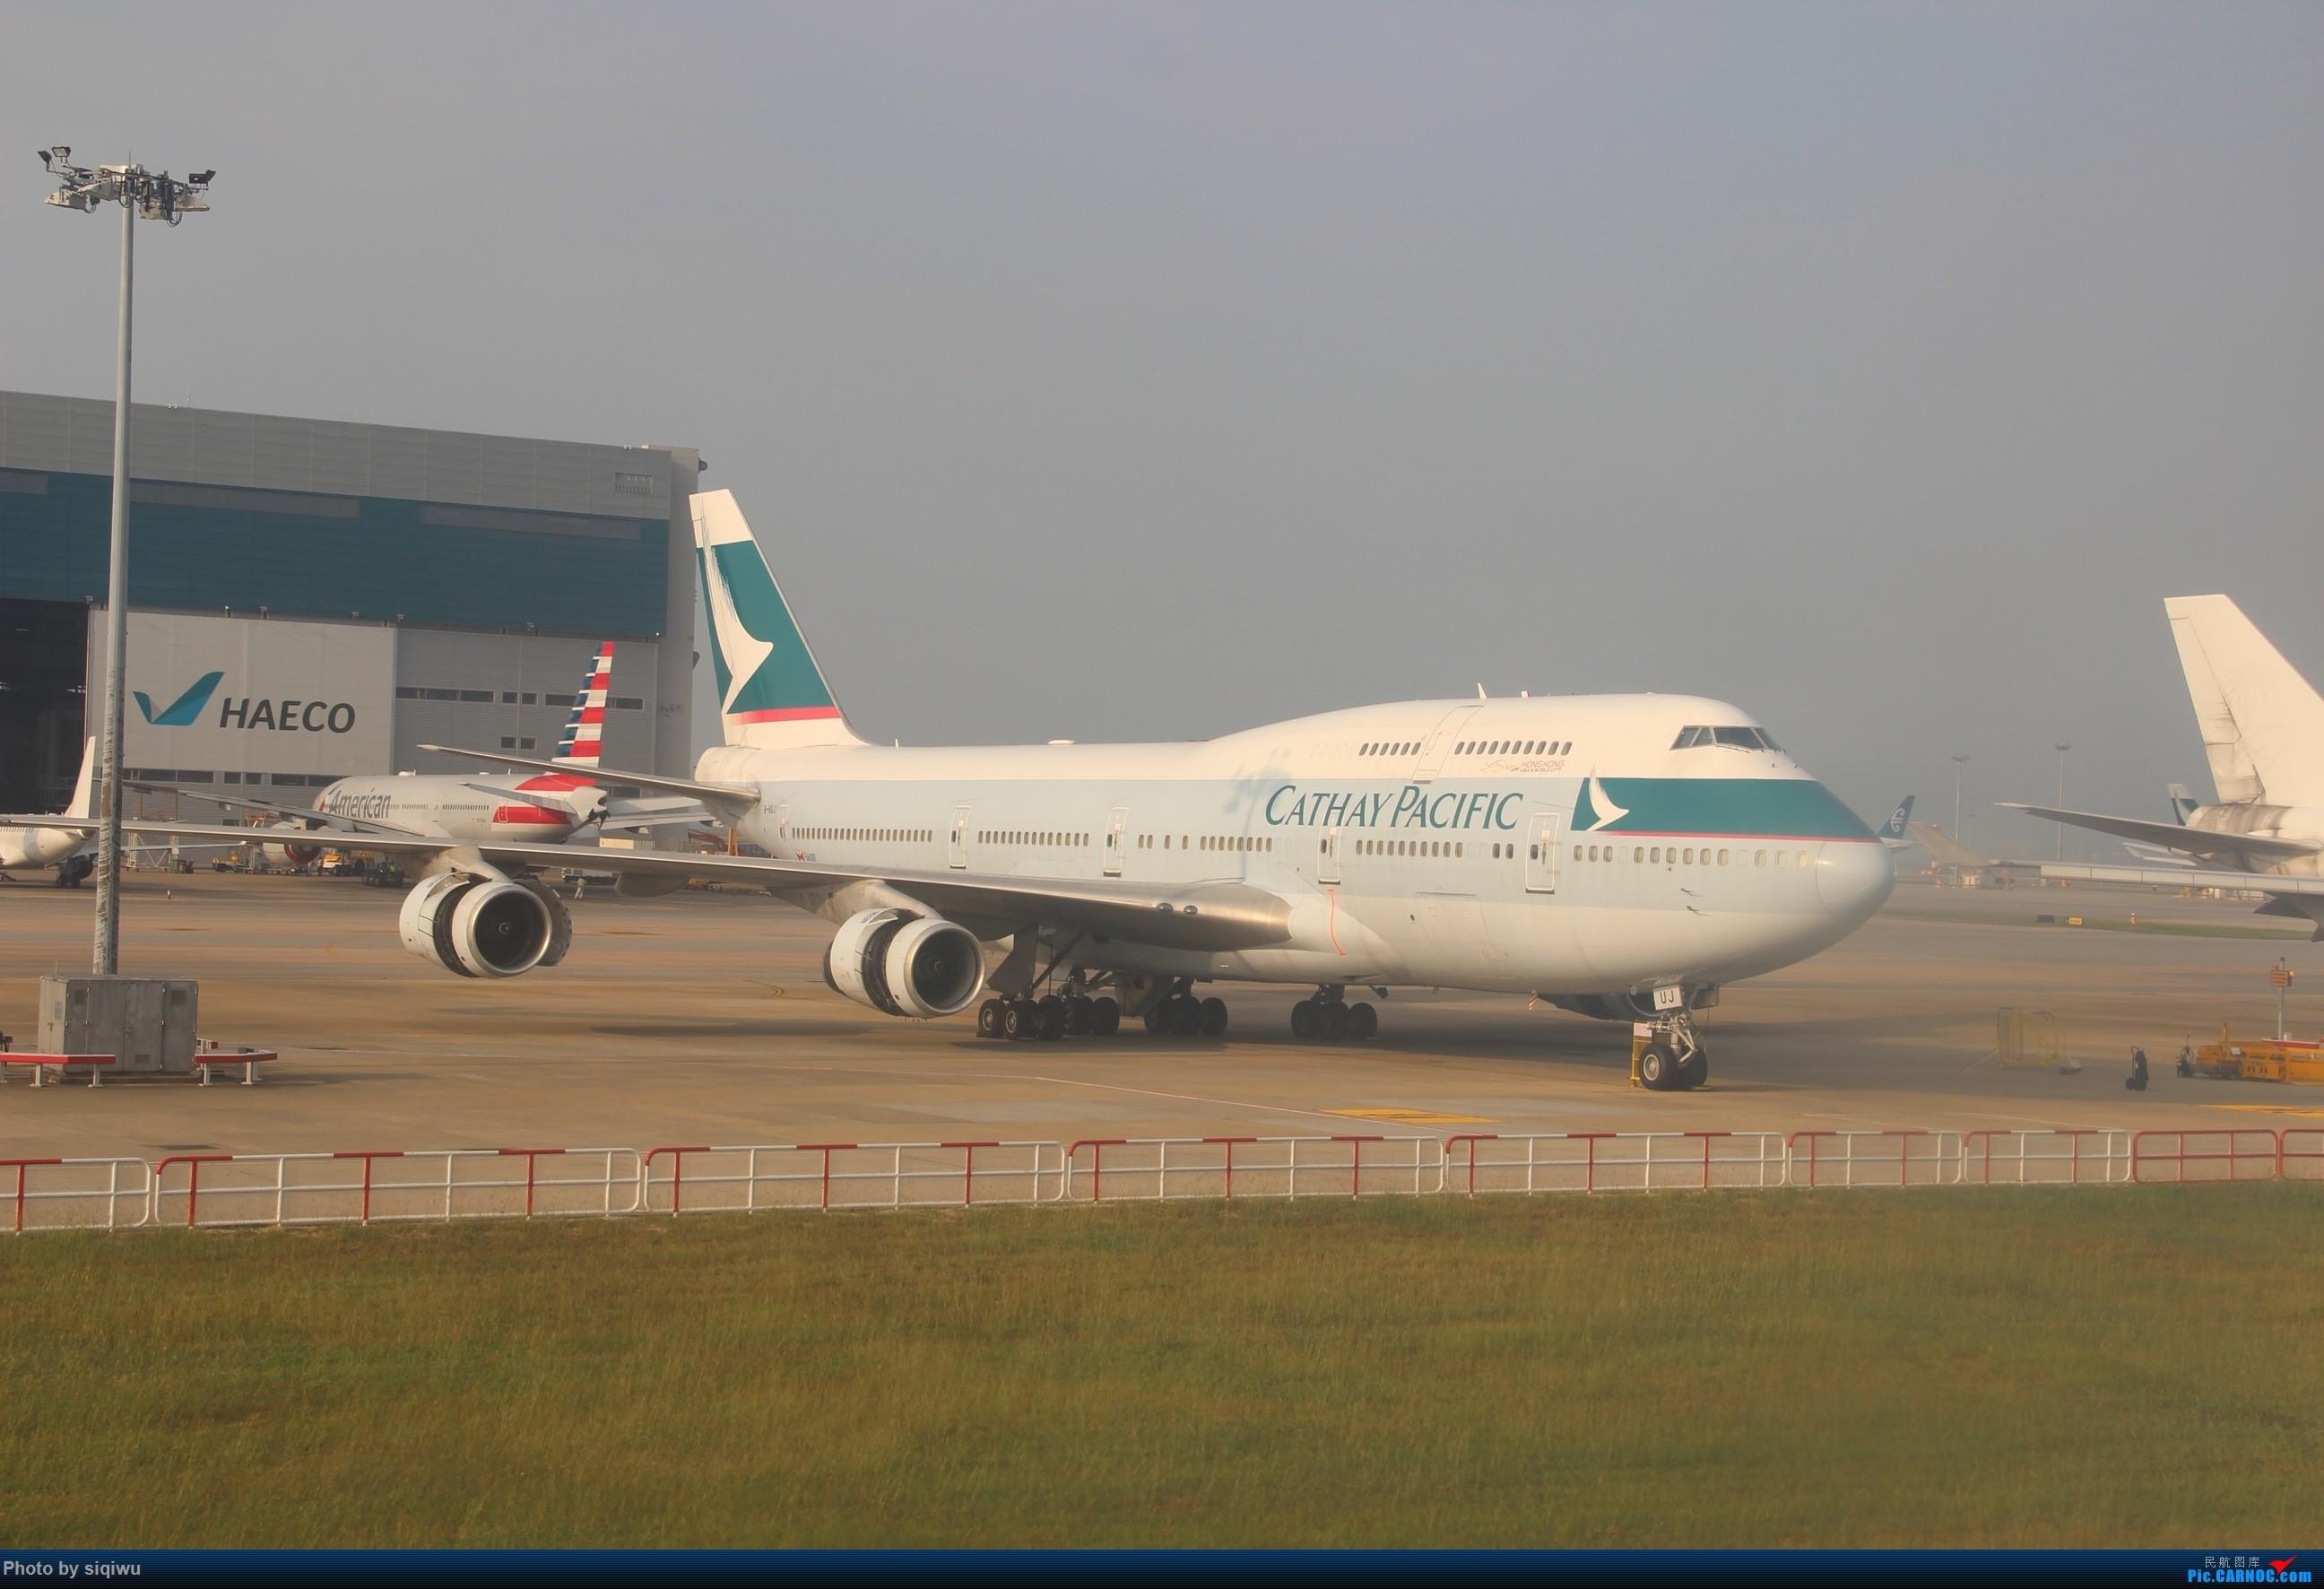 Re:[原创]PVG-HKG-KUL-HKG-PVG 四天往返,CX/KA BOEING 747-400  中国香港国际机场